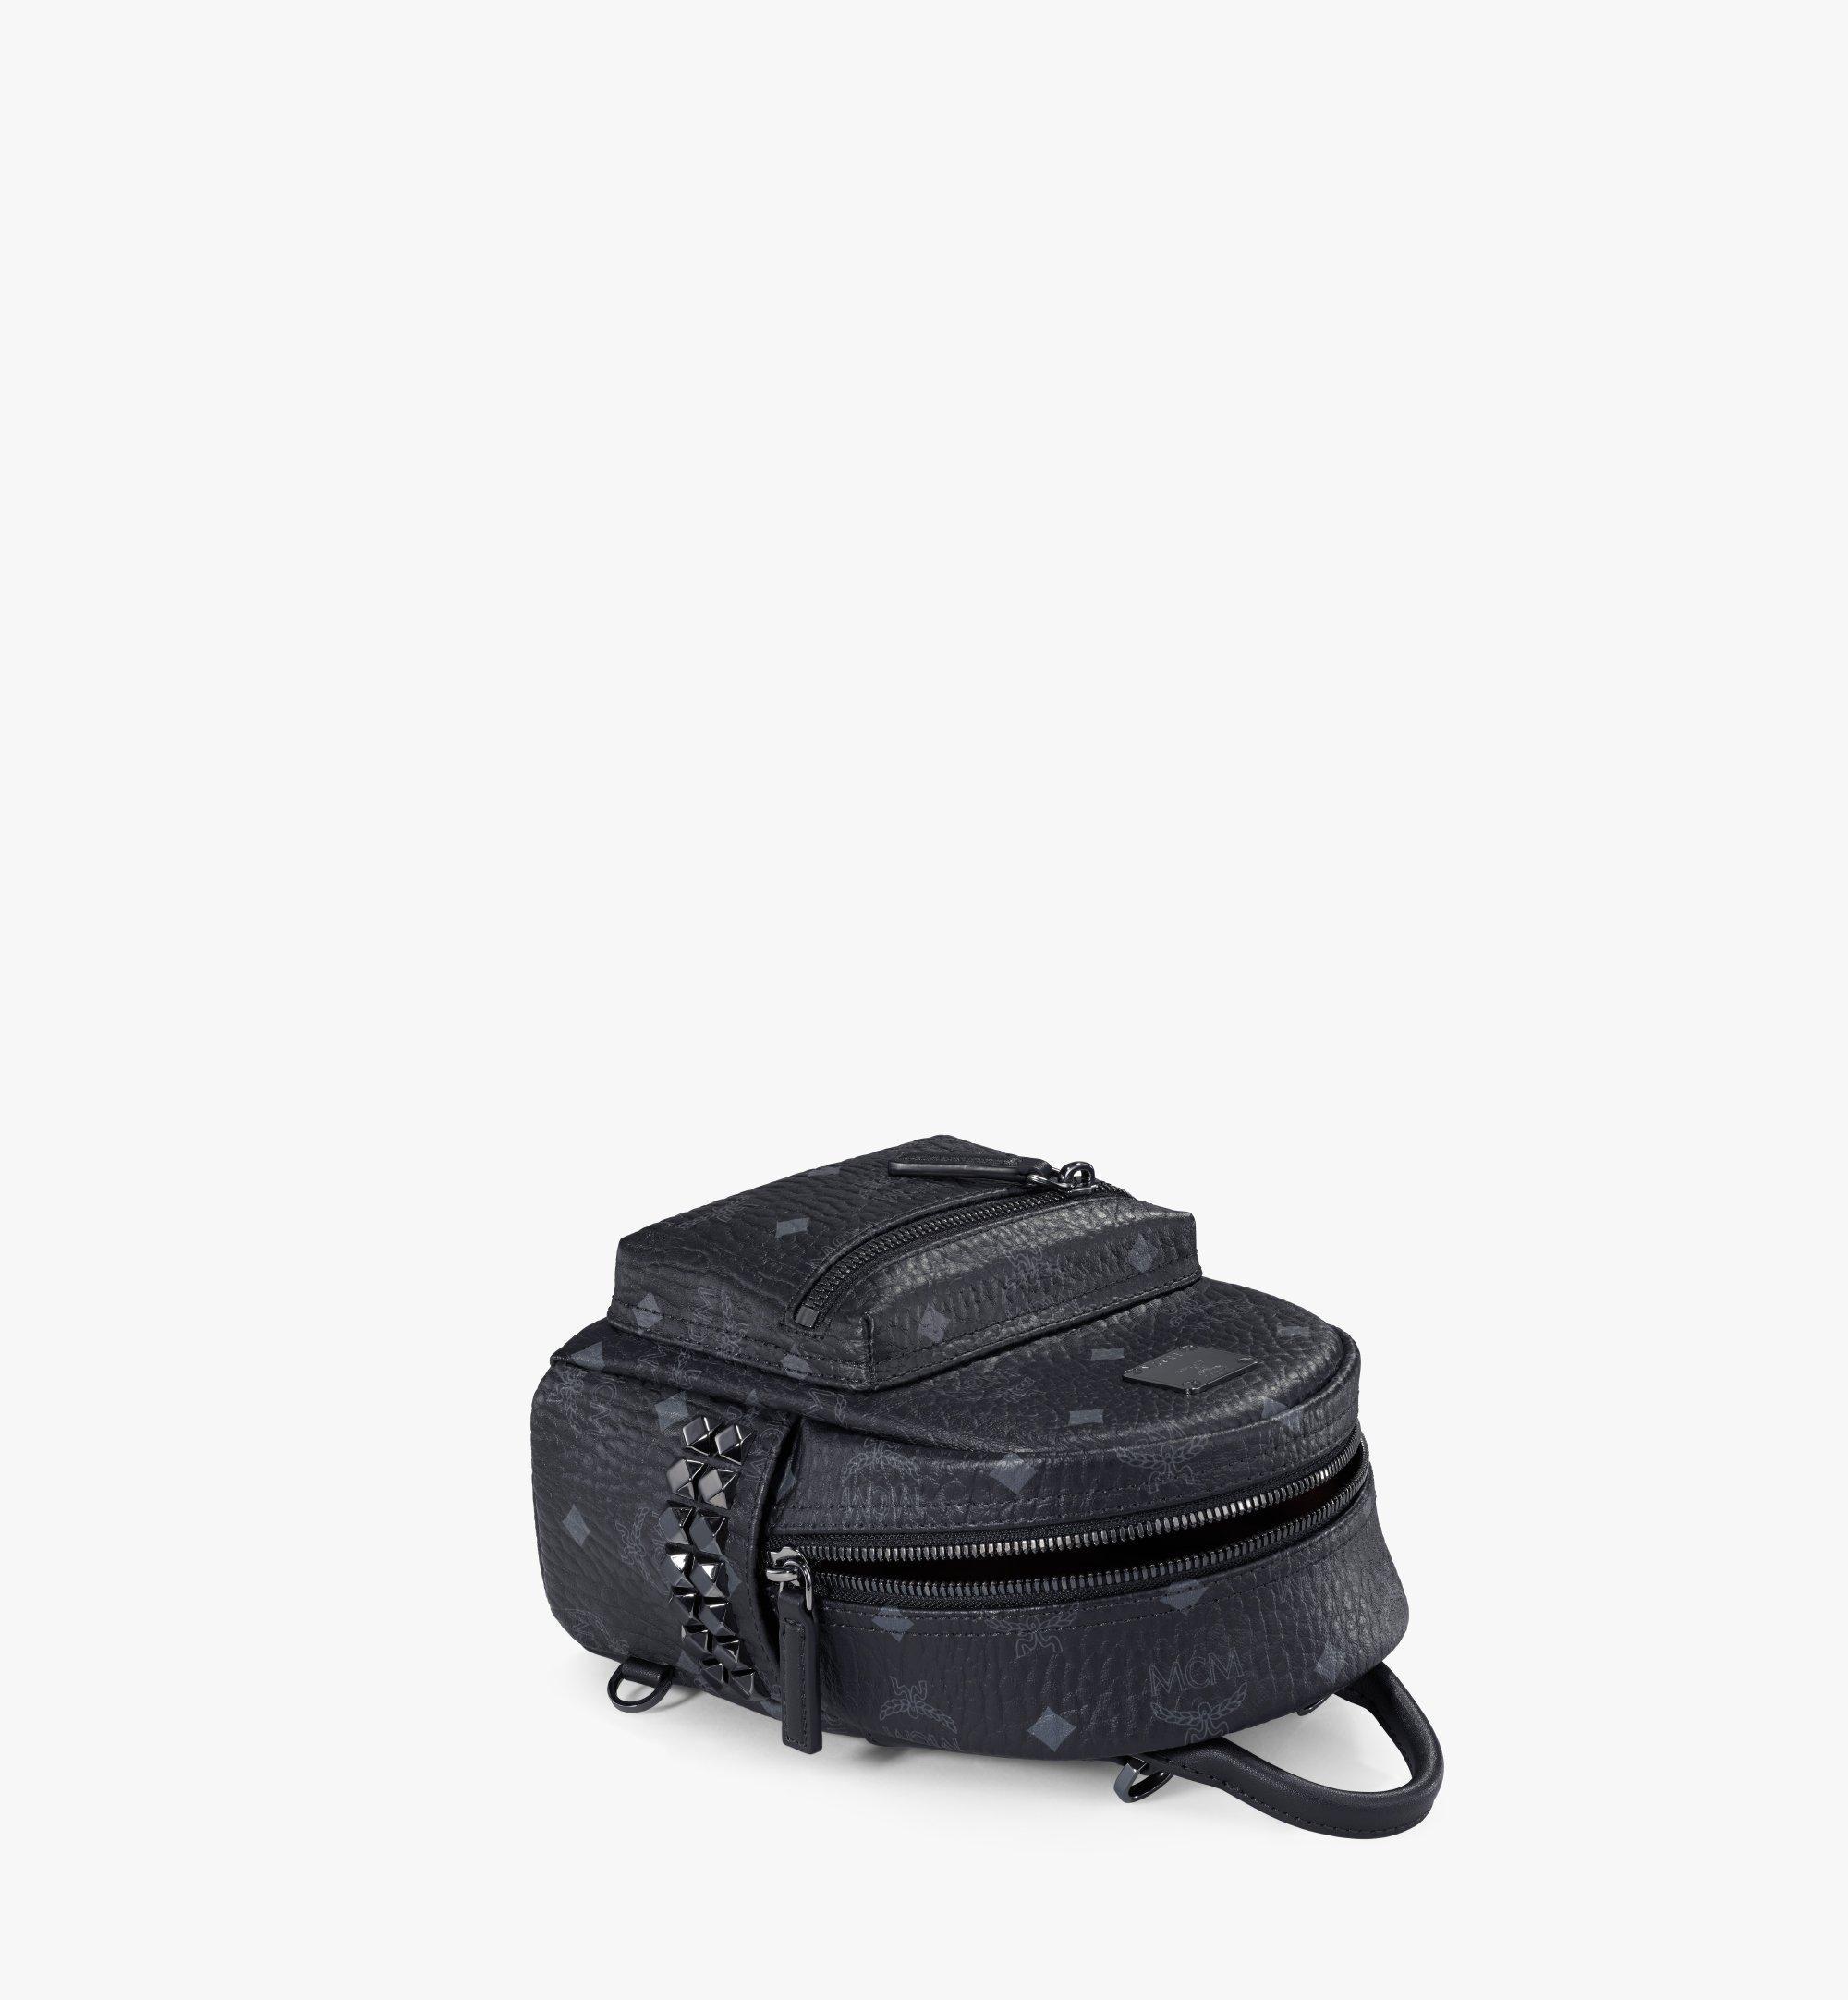 MCM Stark Bebe Boo Backpack in Visetos Black MMK6SVE92BK001 Alternate View 3